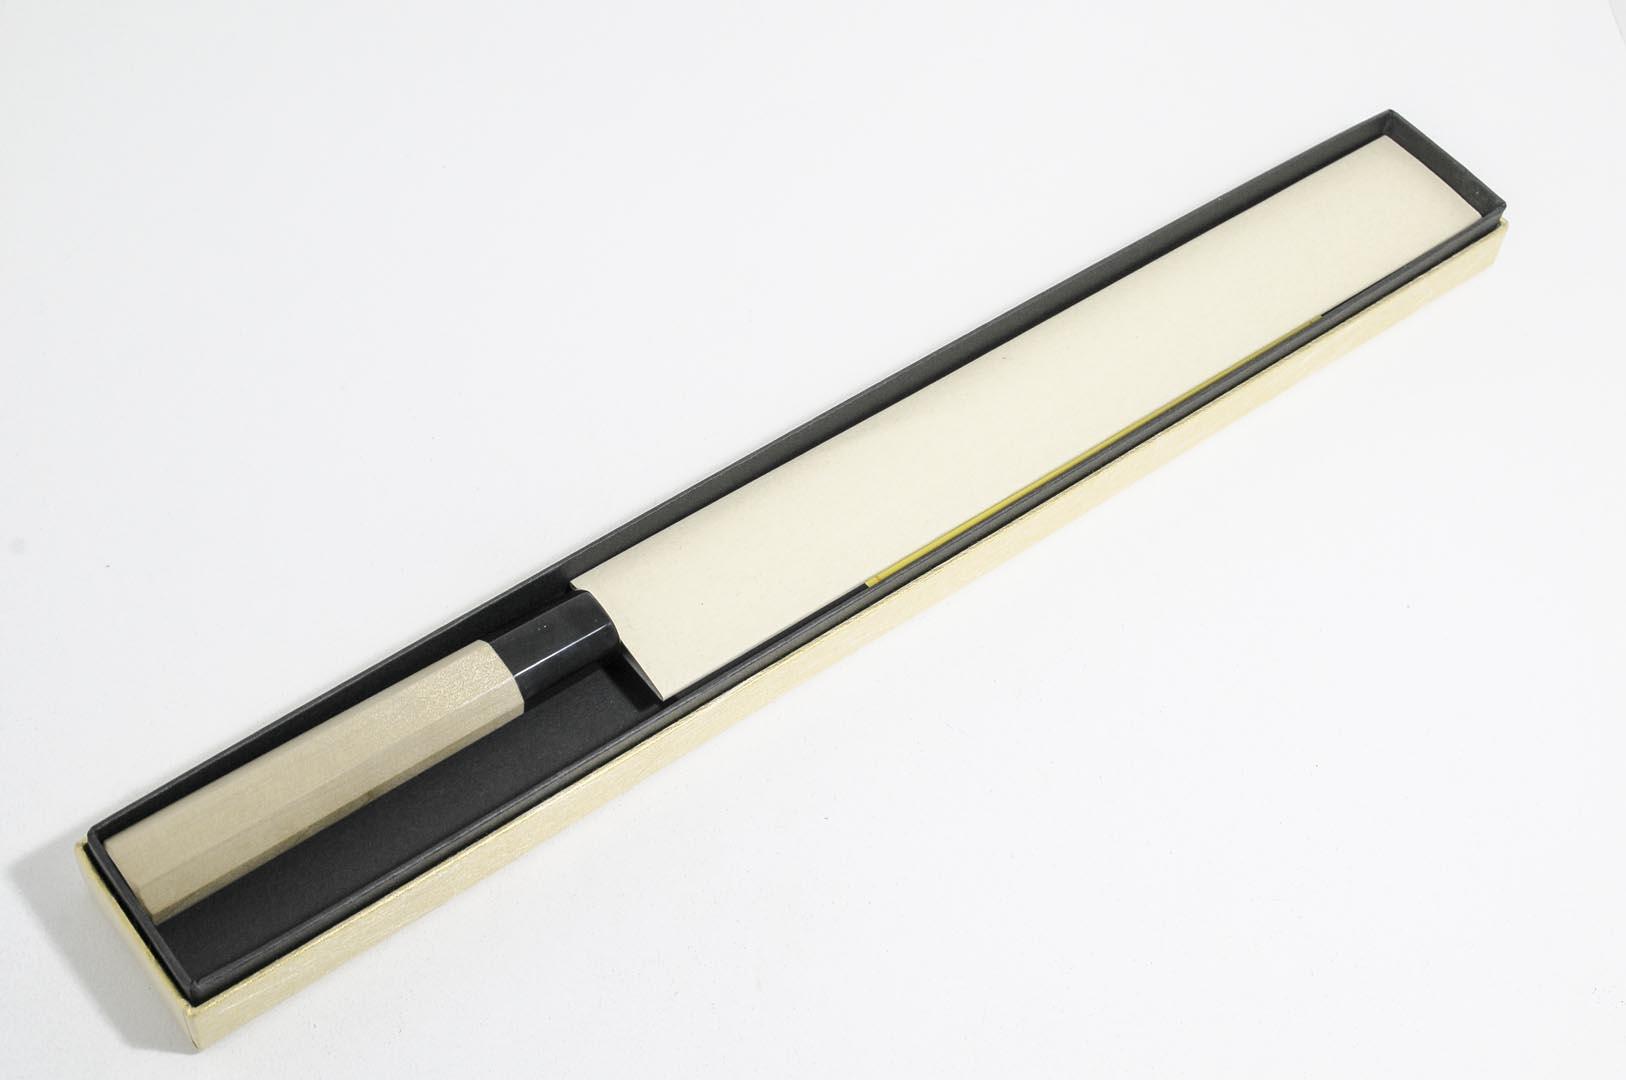 y27w2-Cuchillo Yanagi 27 cm acero Shirogami #2 Yoshihiro y27w2-max-6.